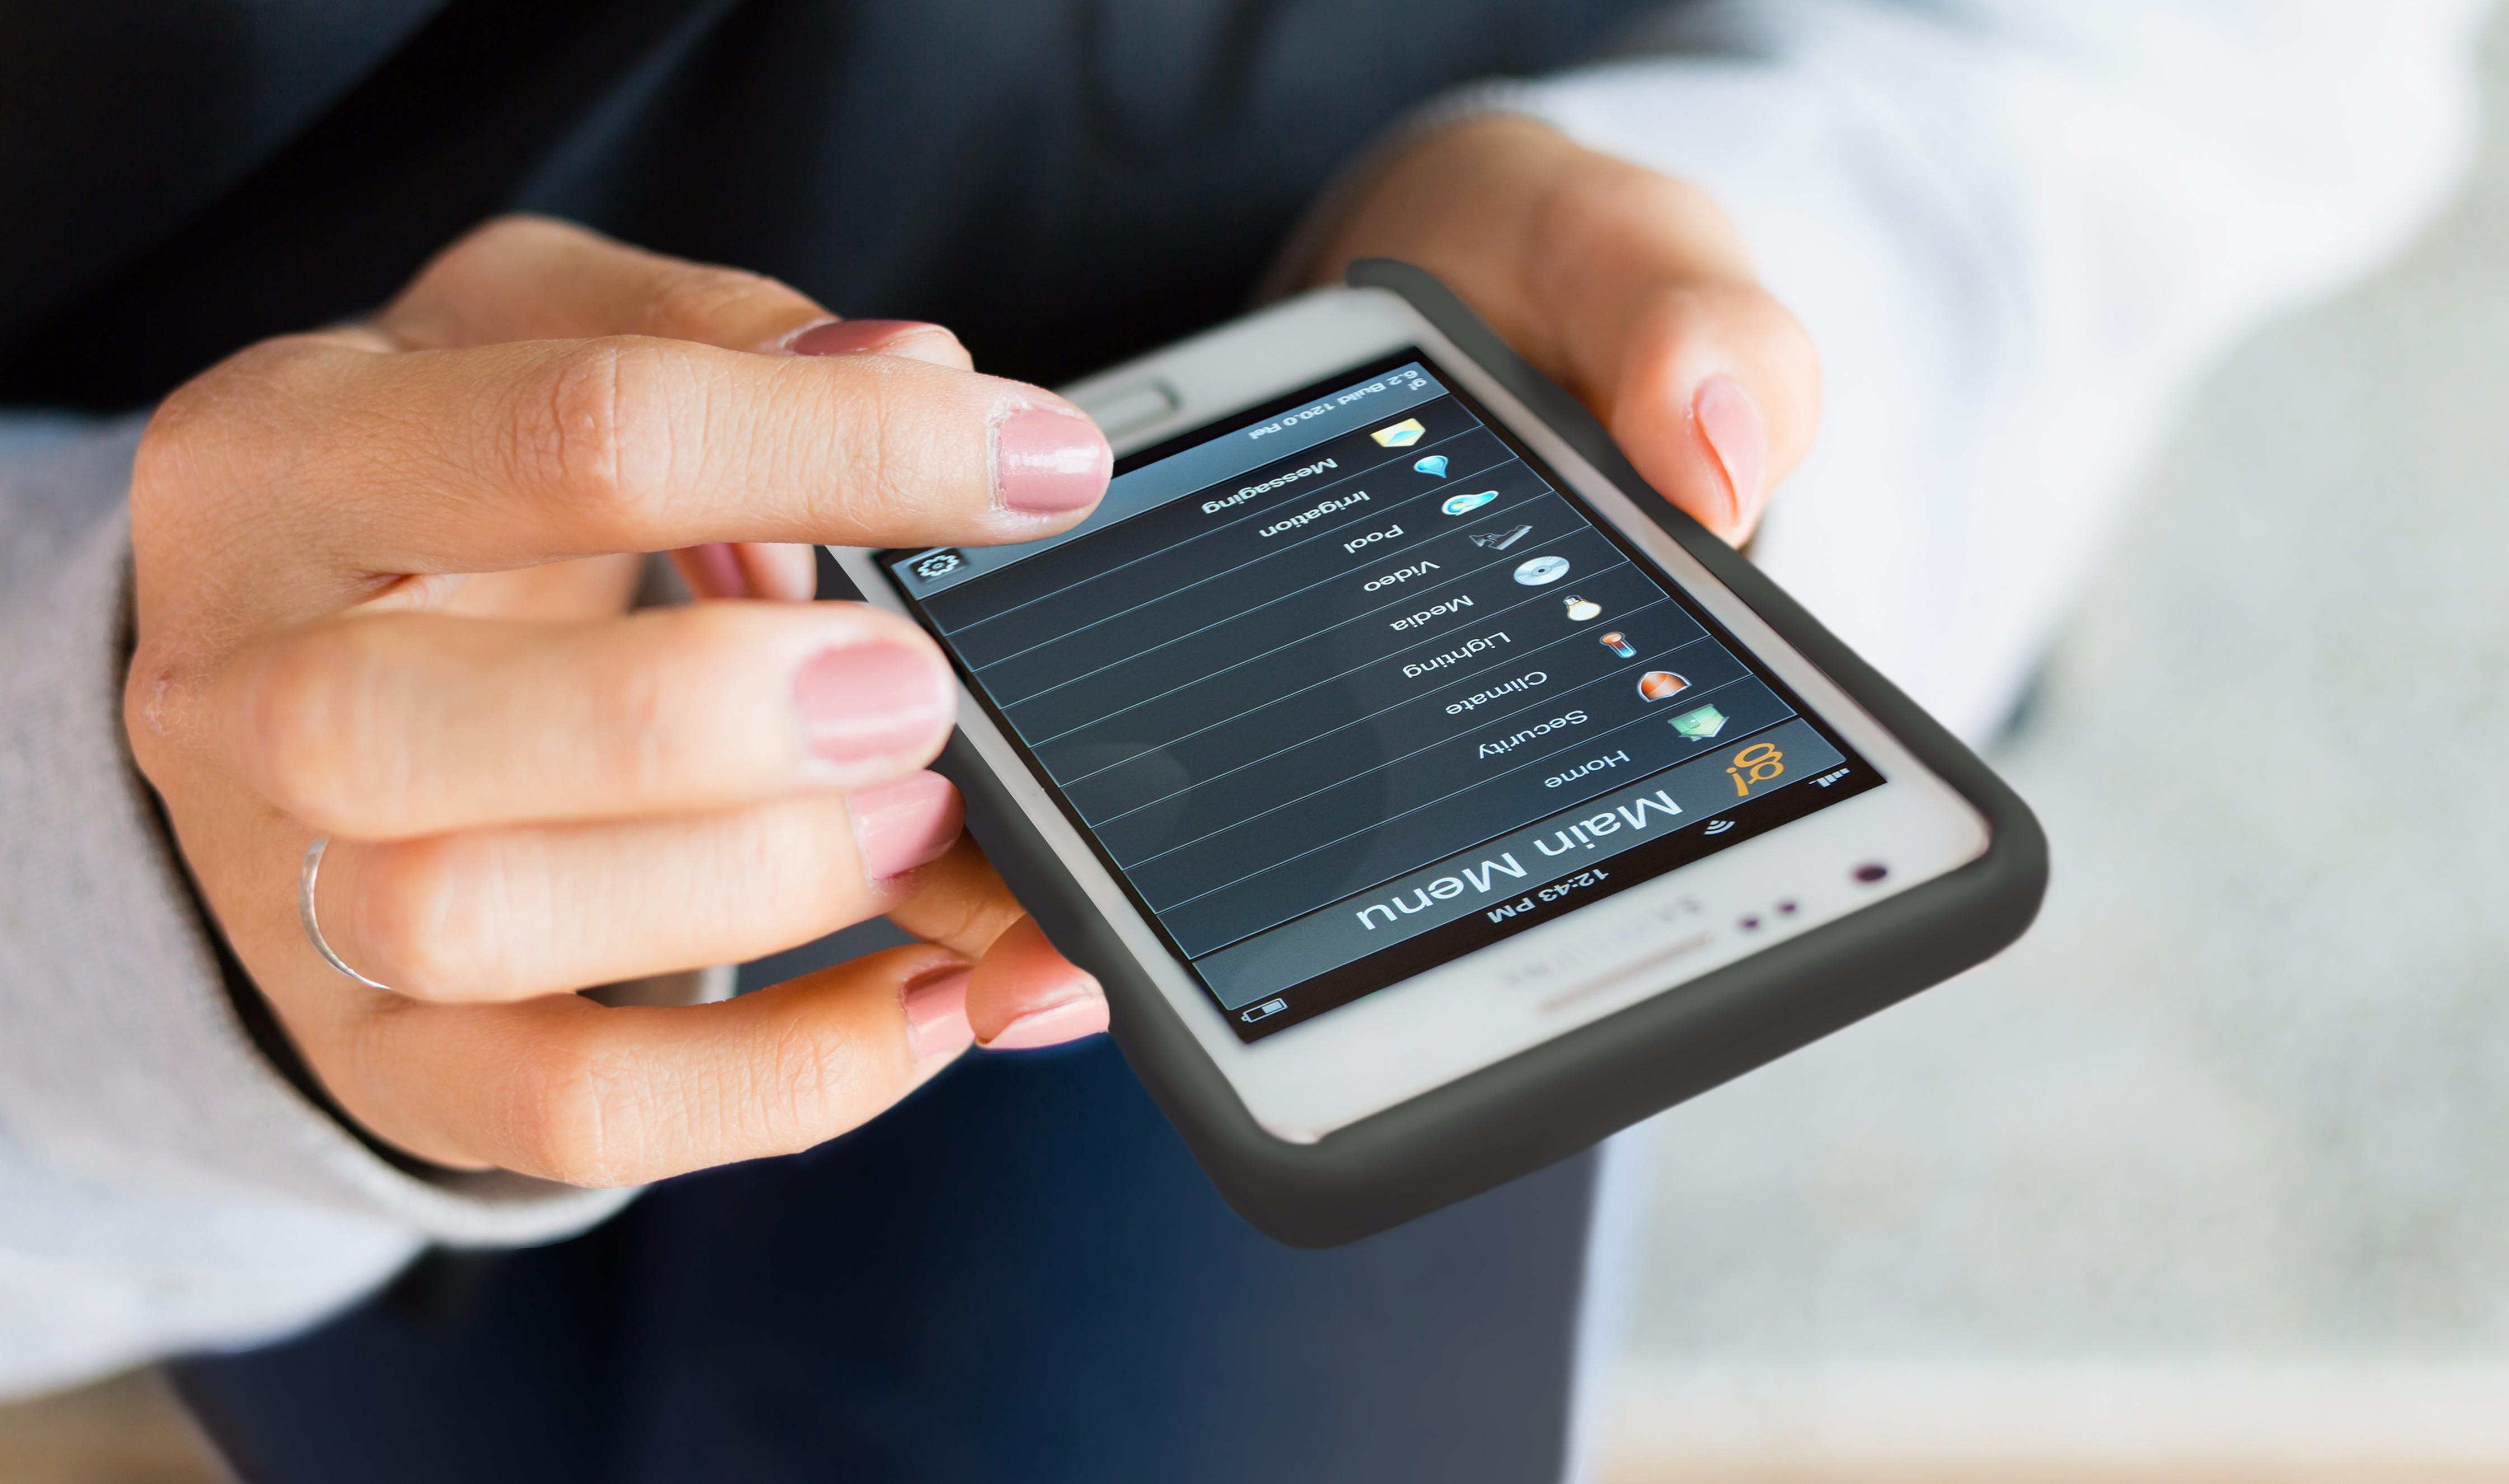 Girl finger touching screen on mobile phone